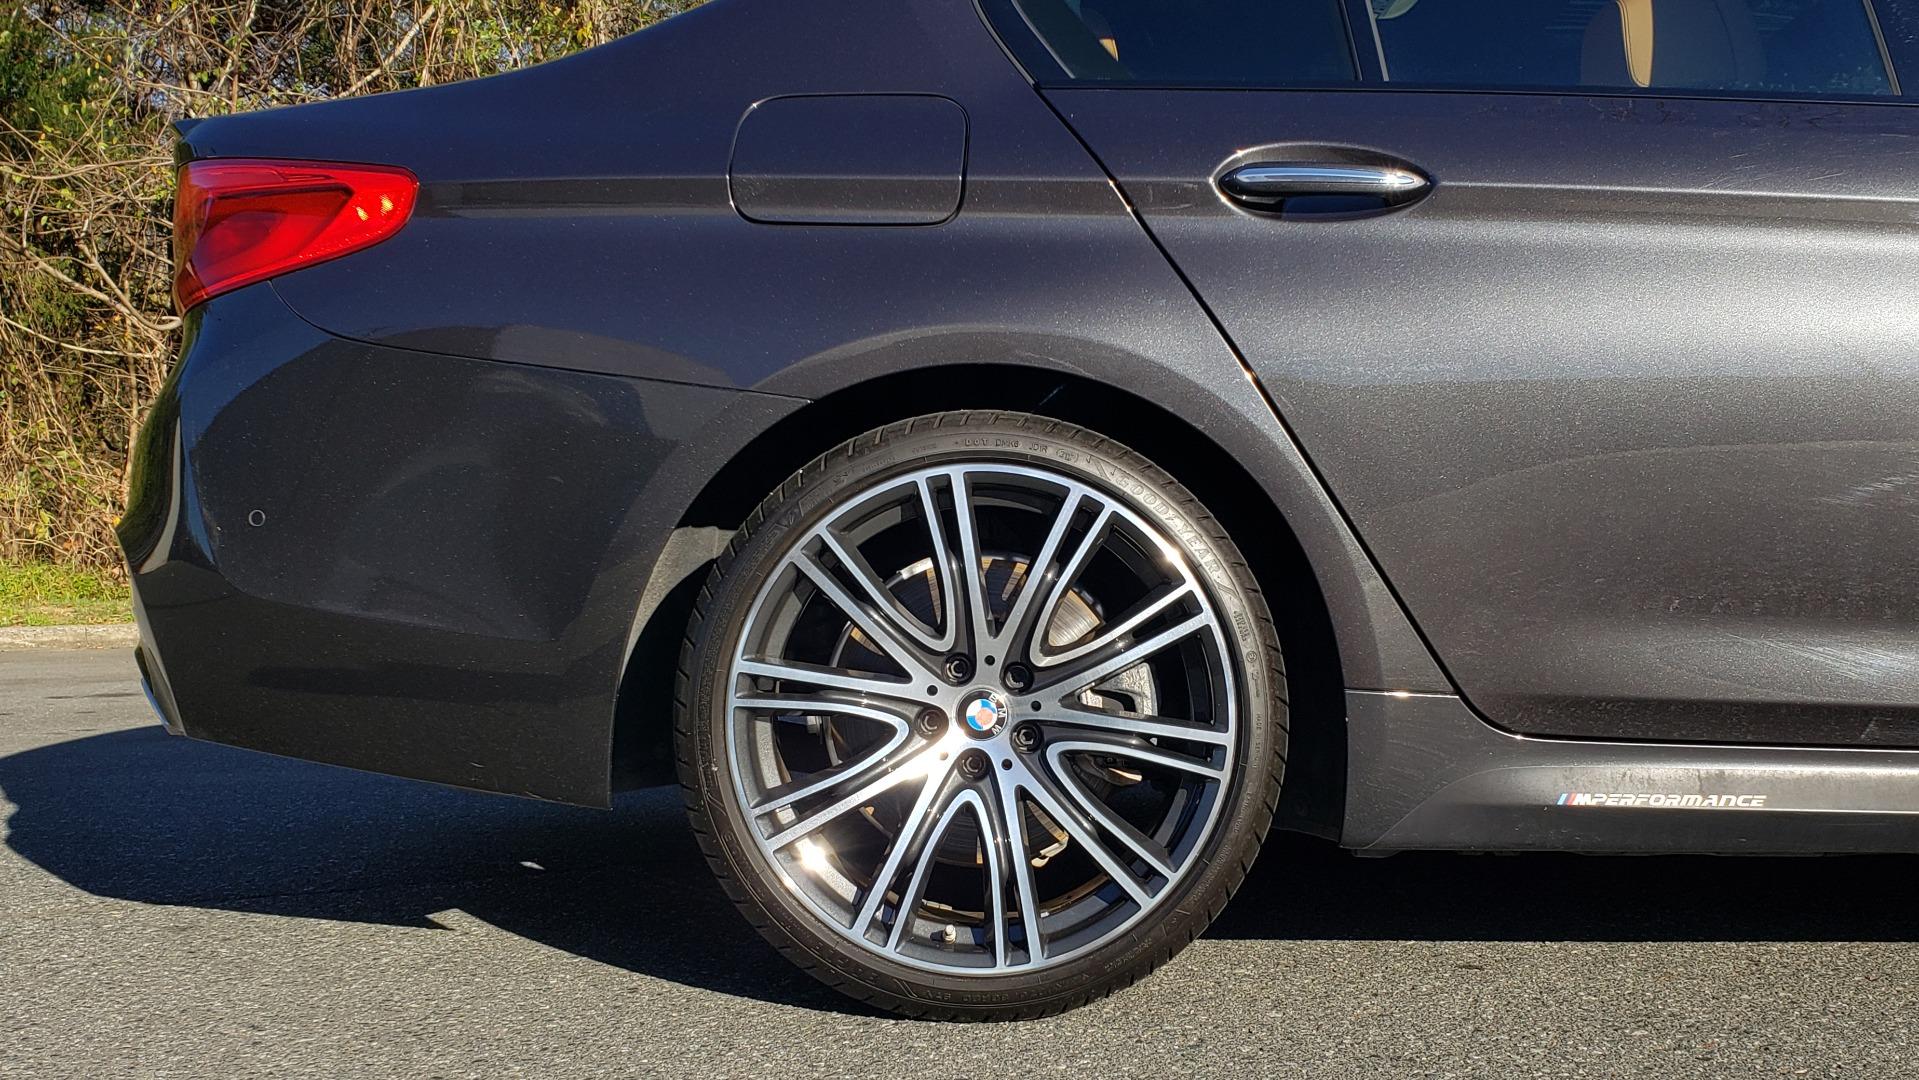 Used 2018 BMW 5 SERIES 540I M-SPORT / DRVR ASST / EXEC PKG / NAV / SUNROOF / HUD / REARVIEW for sale Sold at Formula Imports in Charlotte NC 28227 80